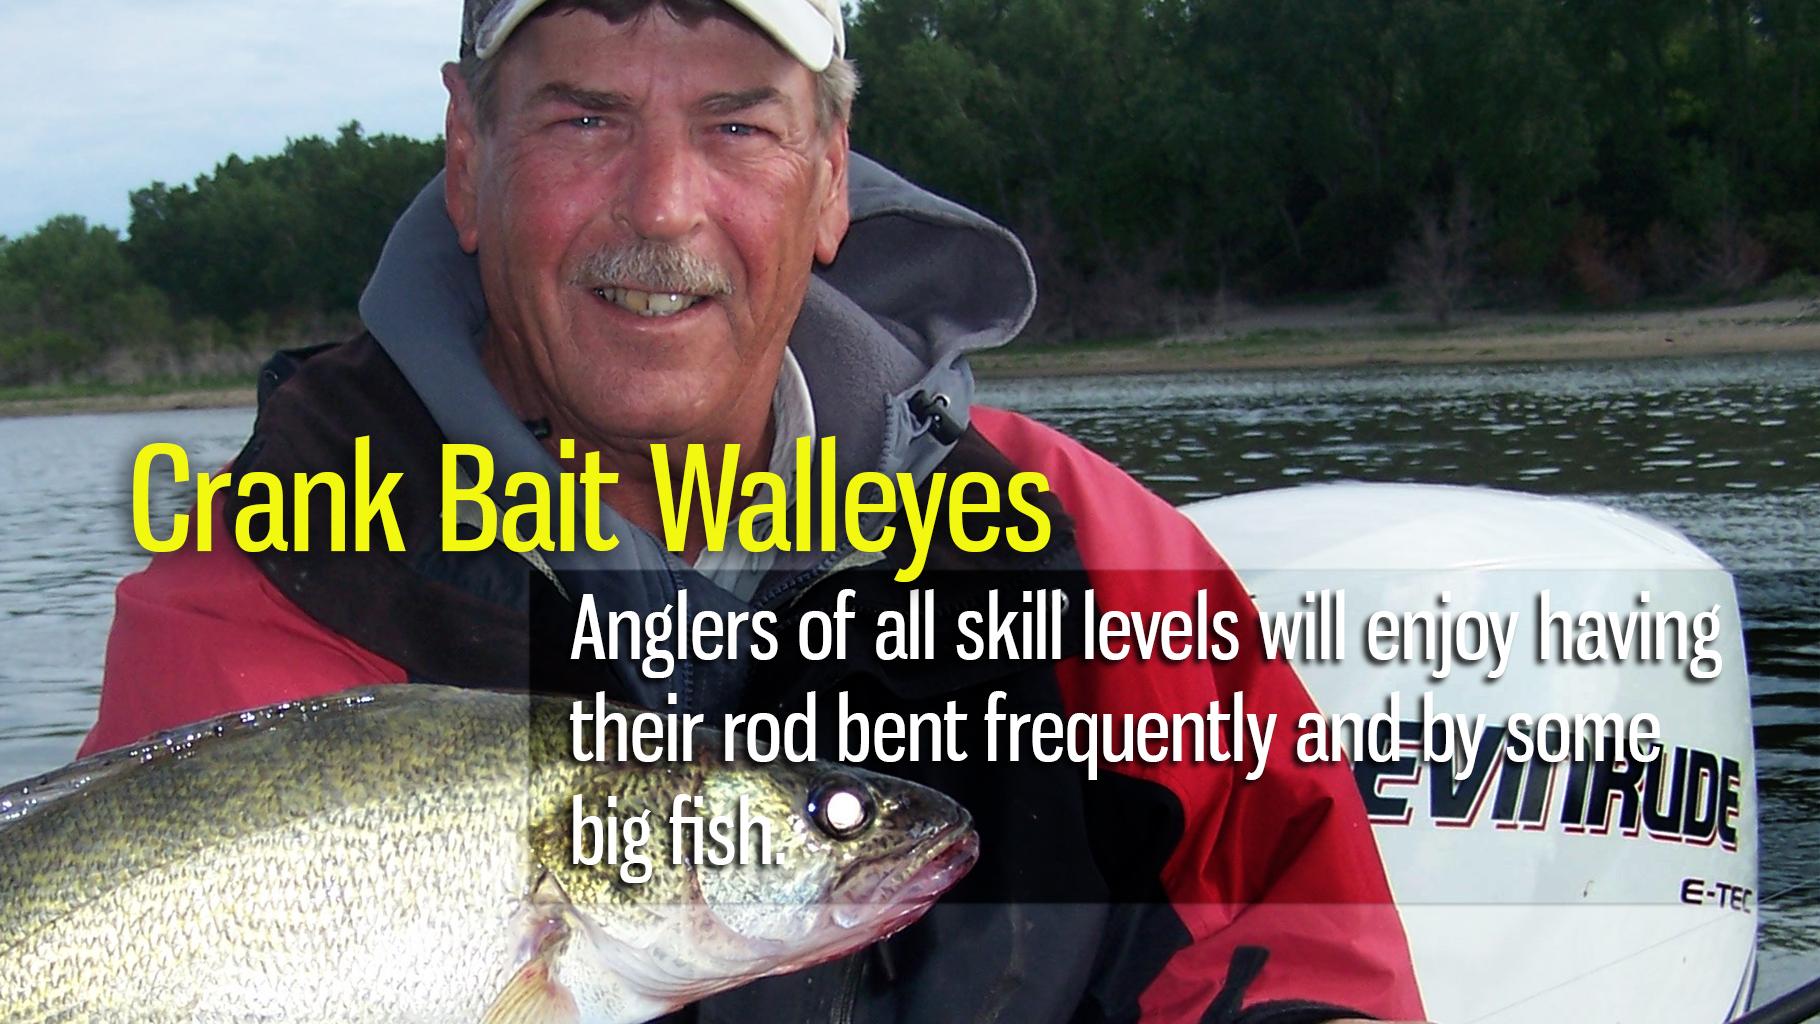 Crank Bait Walleyes